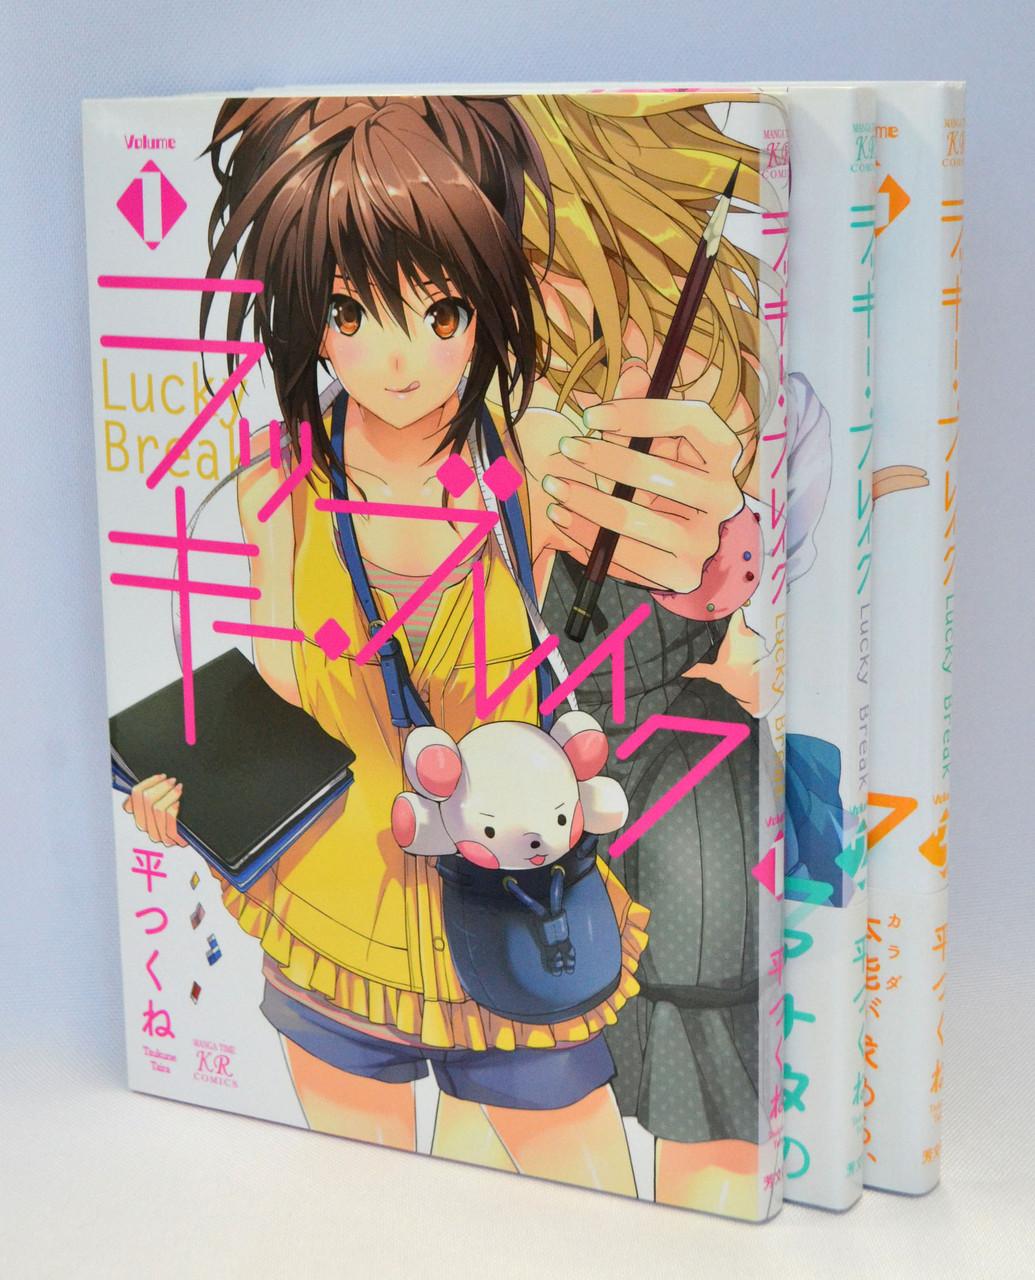 Манга на японській мові Lucky Break - Break all 3 volumes set (3 з 3)